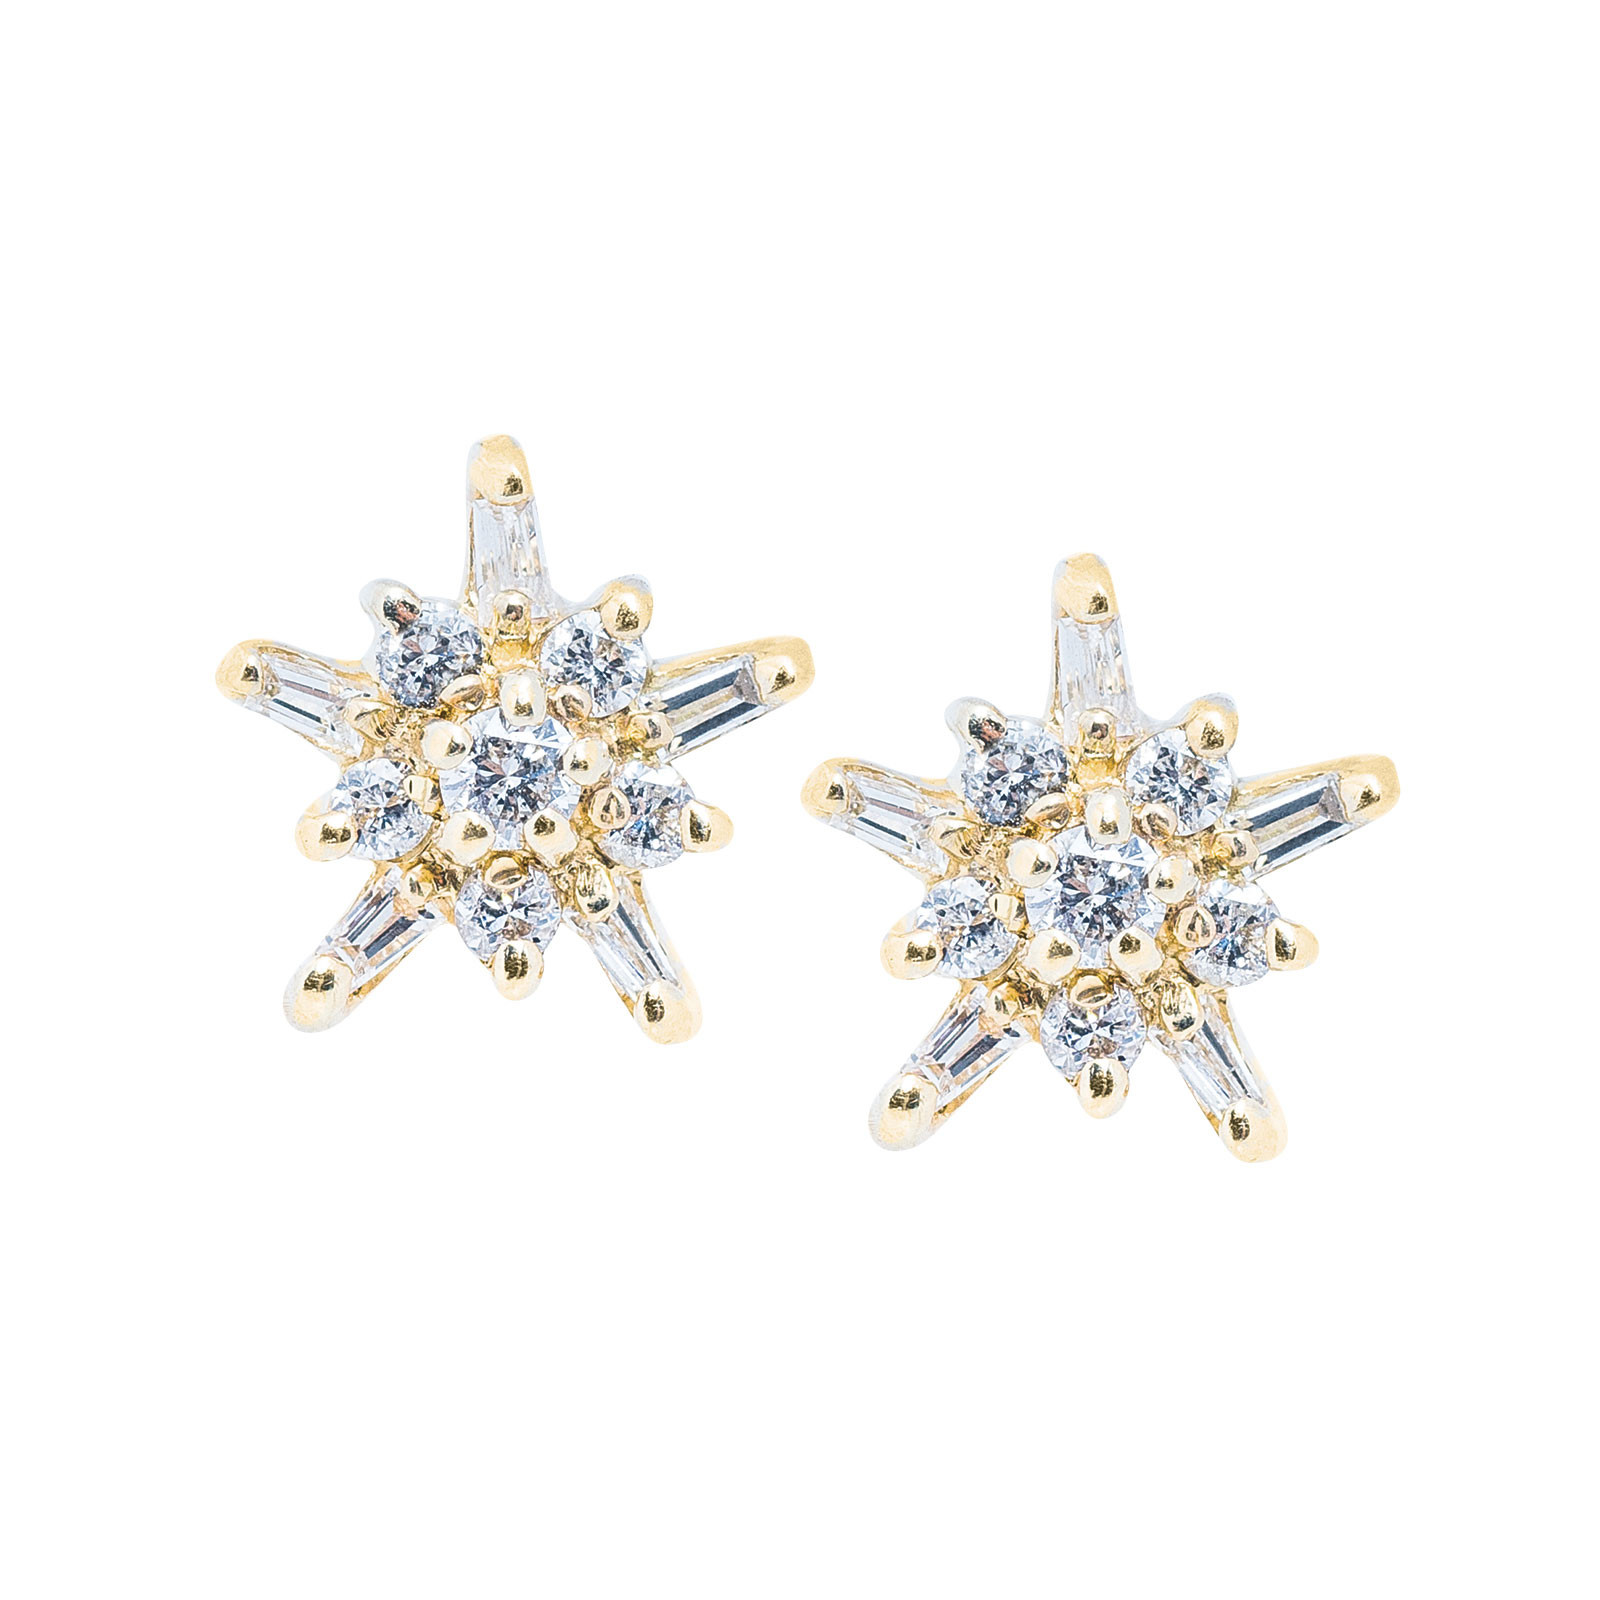 Vintage 0.24 CTW Diamond Cluster Earrings